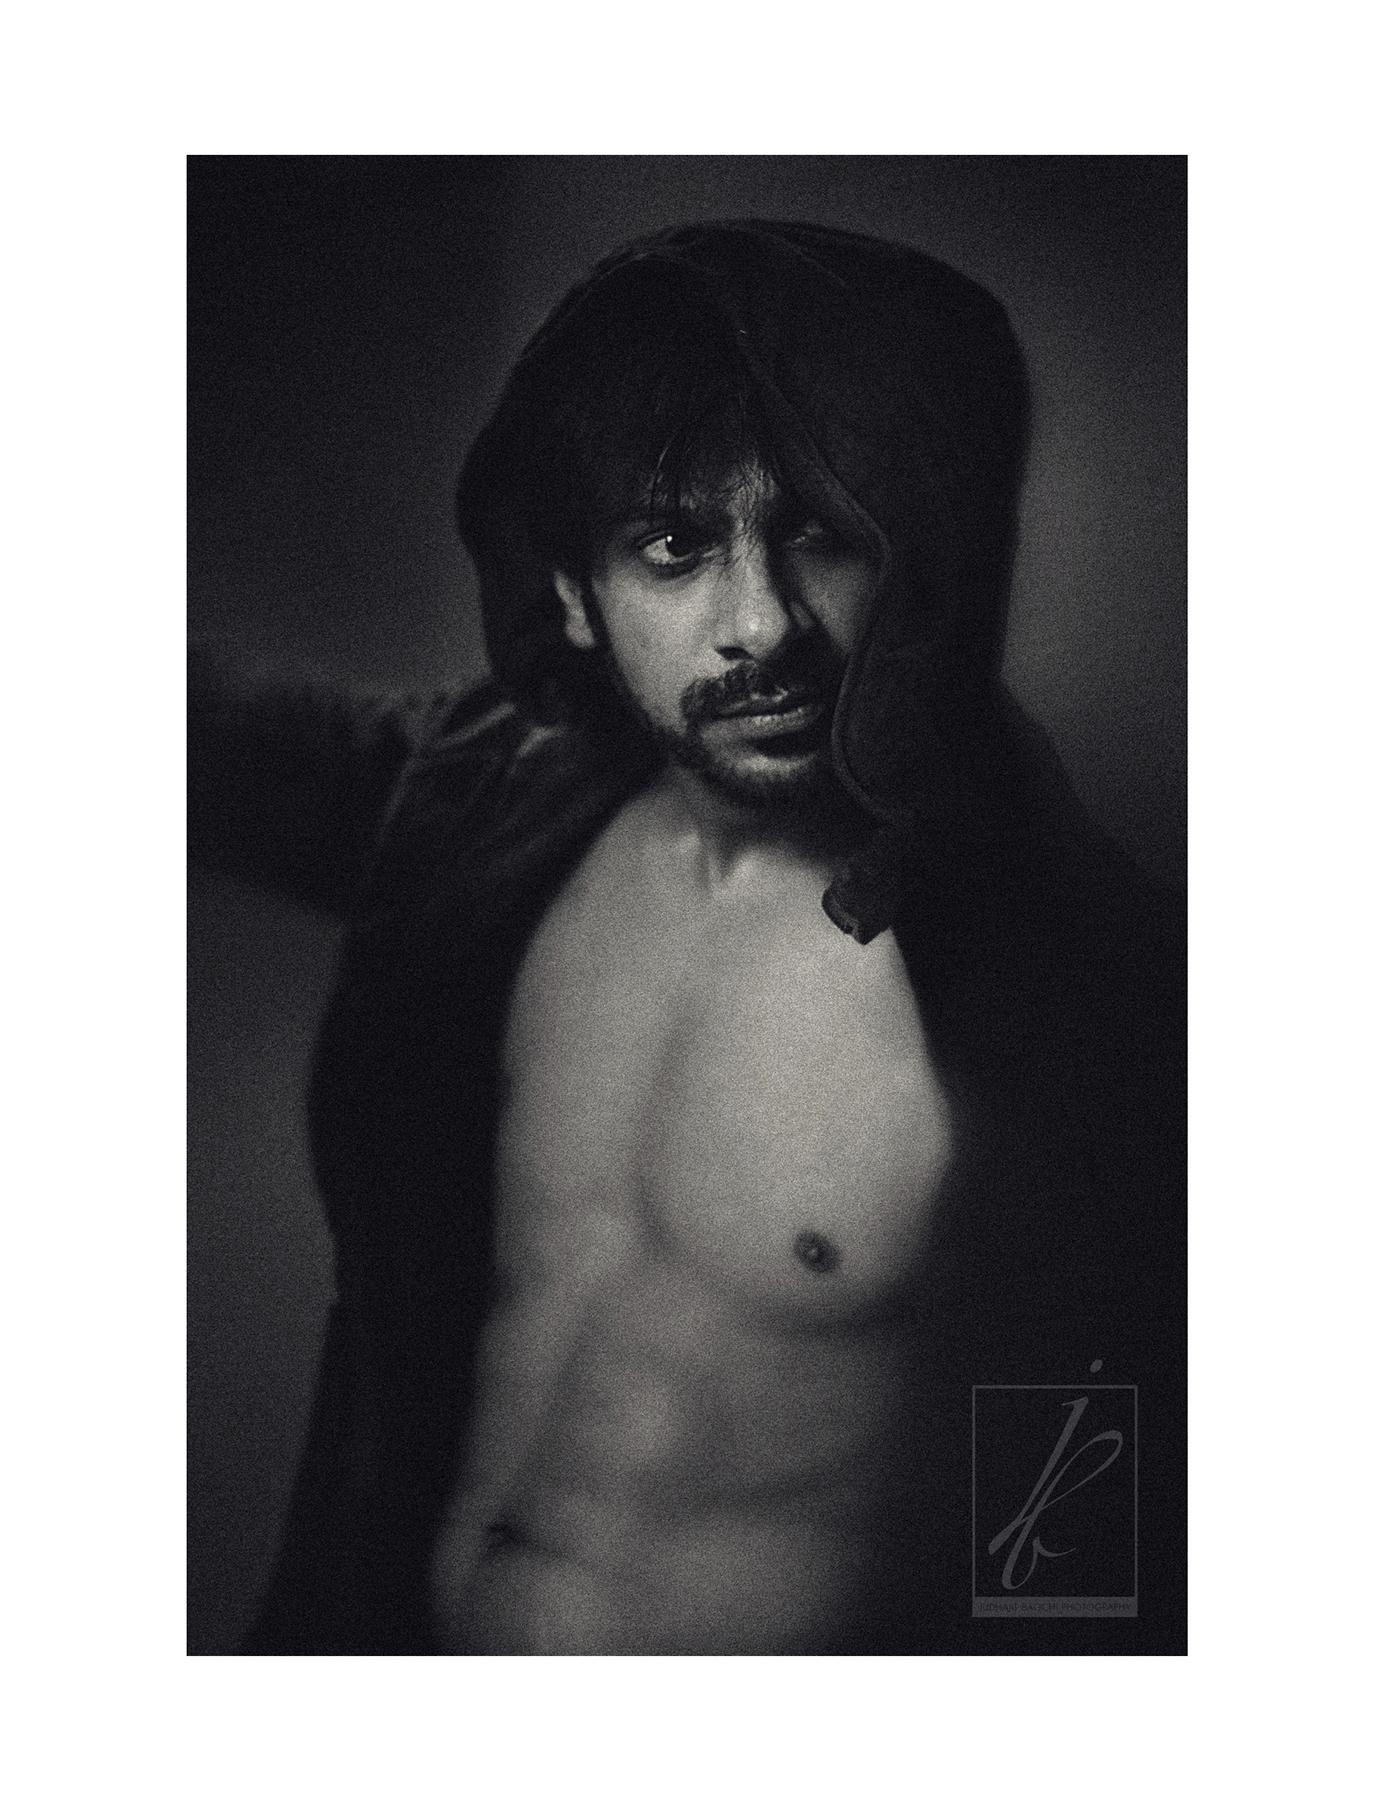 Bollywood,actor,male nude,acting,Hero,male,star,portfolio,India,indian actor,photoshoot,karan veer mehra,karan mehra,yaanus